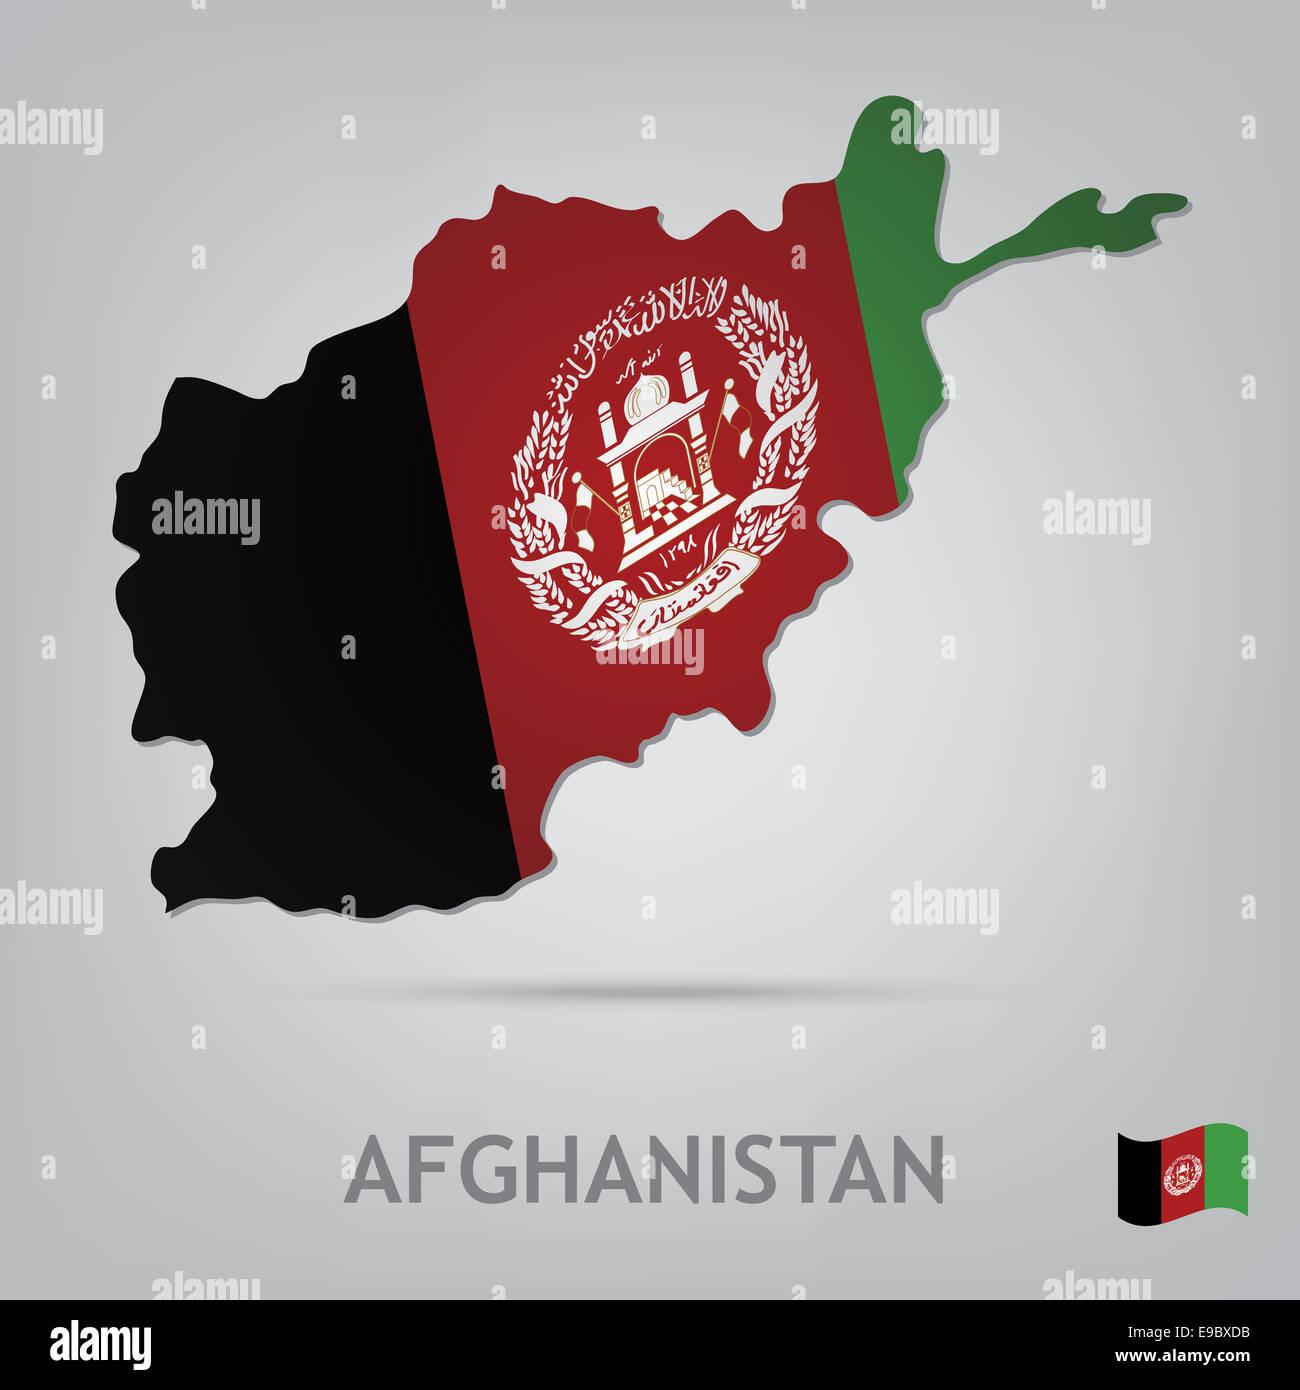 afghanistan - Stock Image